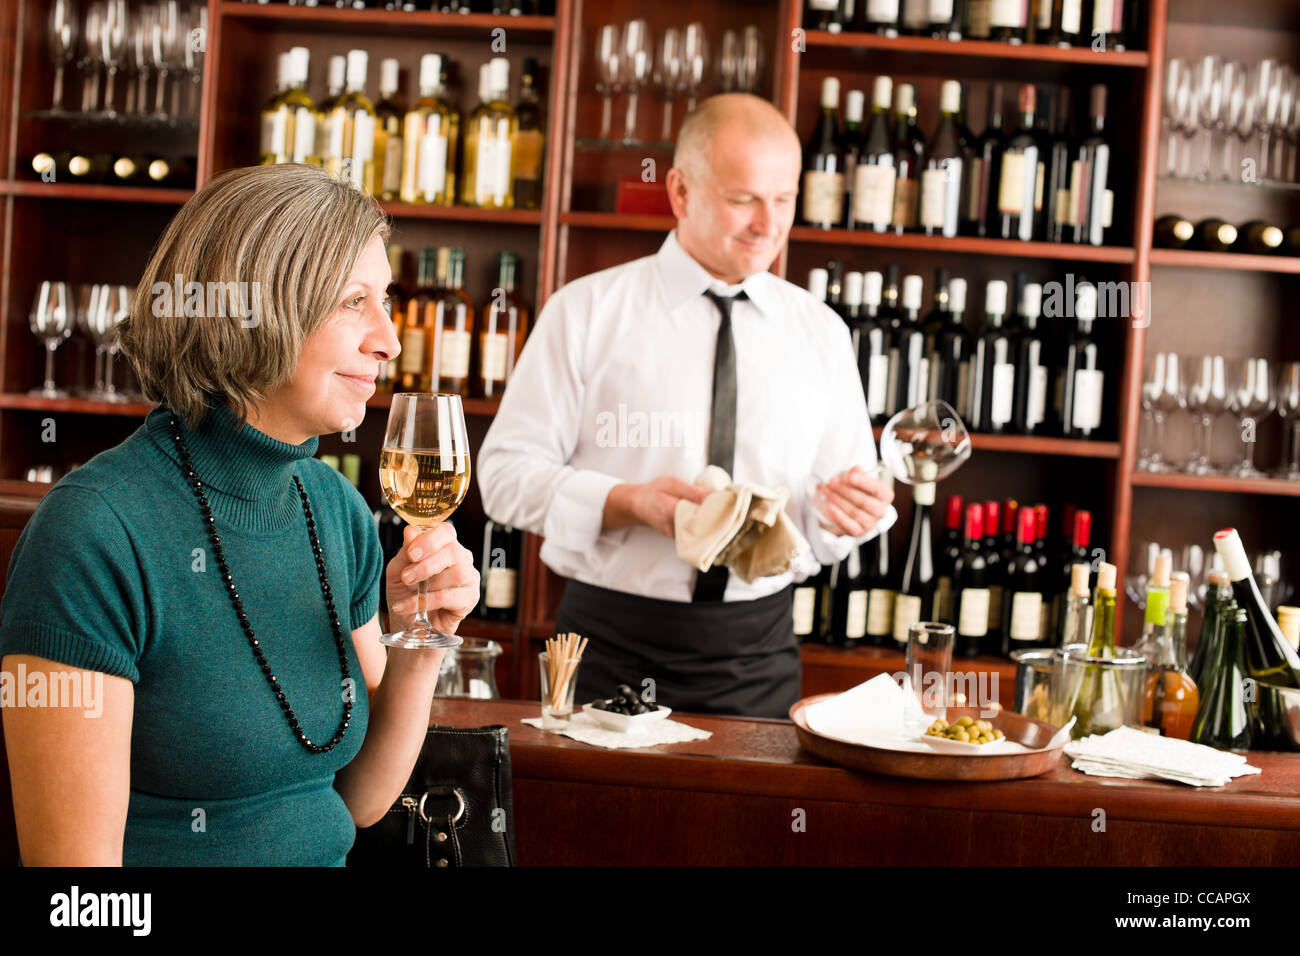 Restaurant Manager Counter Stockfotos & Restaurant Manager Counter ...